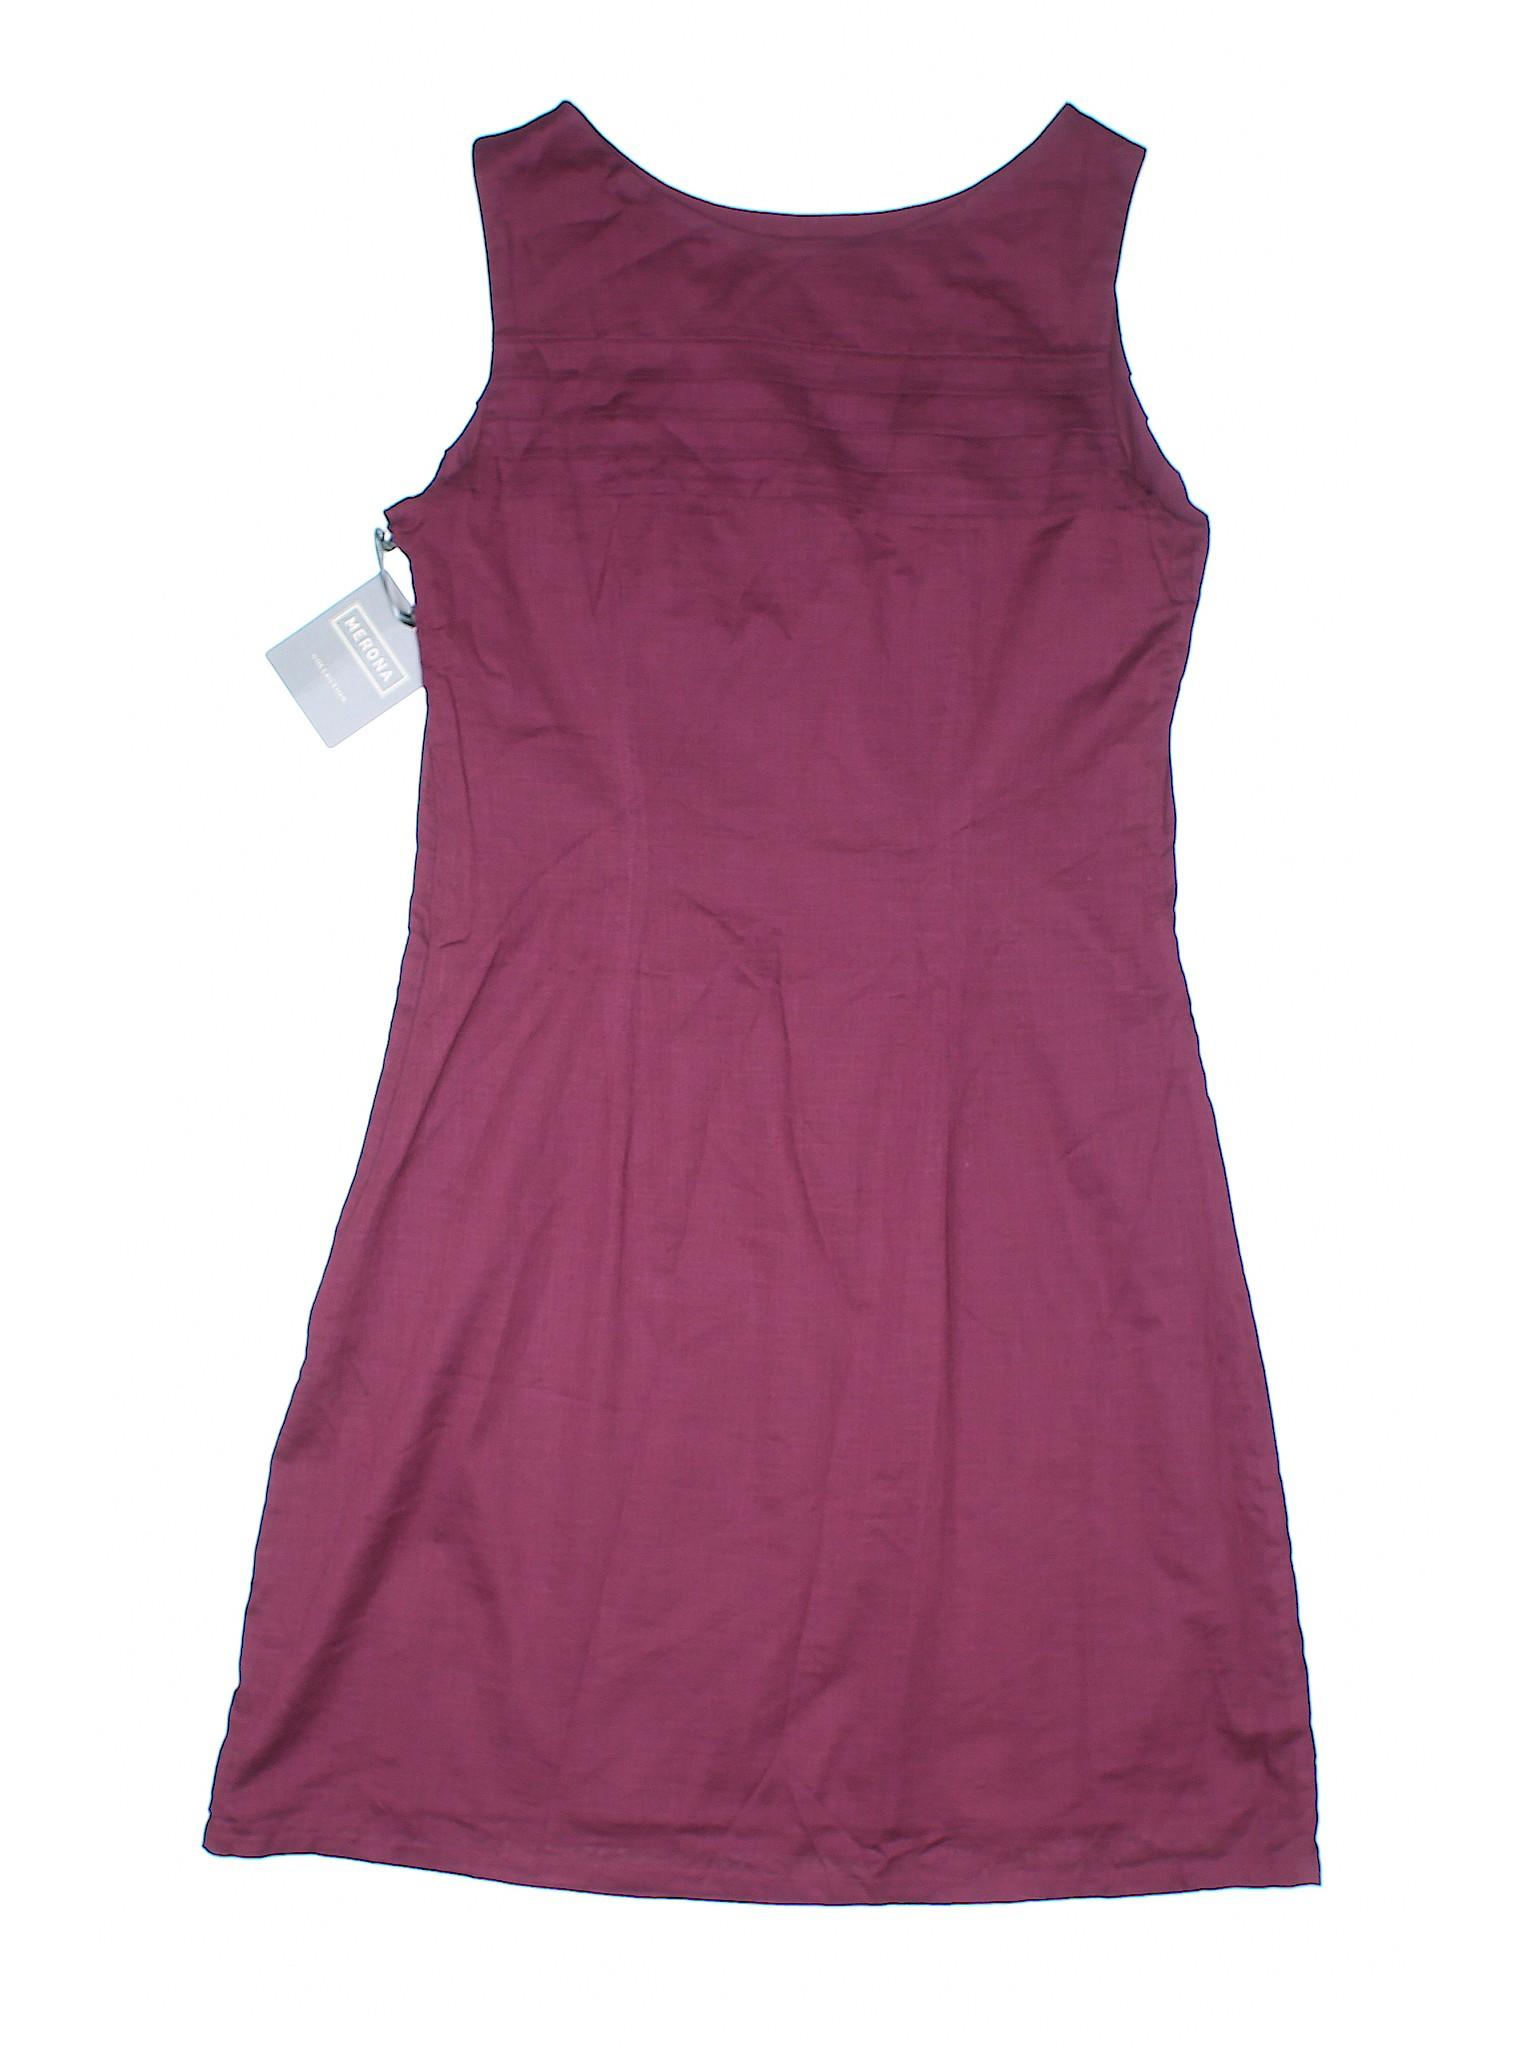 Dress Boutique Merona Boutique Casual Merona winter winter fxxqwvgY